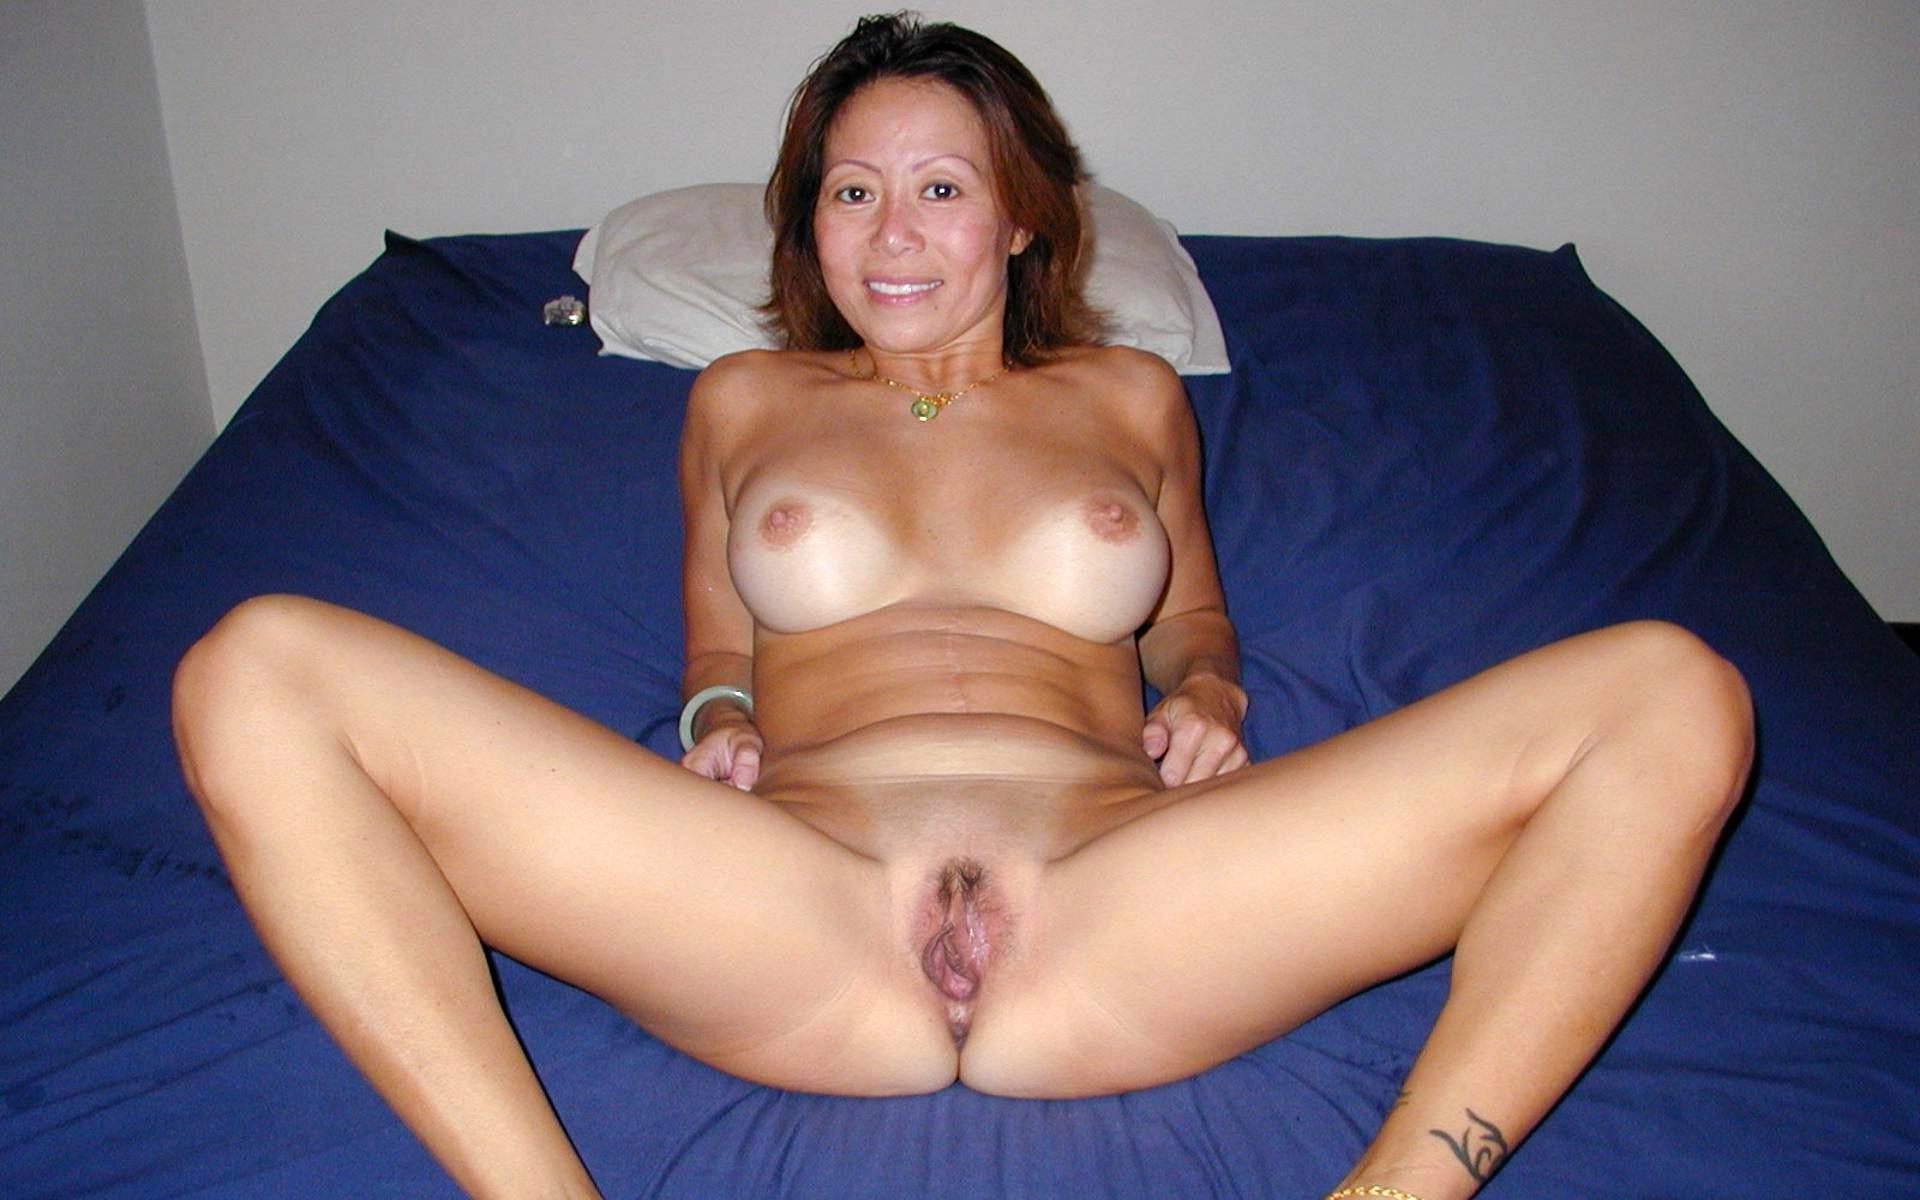 Sexy mature asian women nude